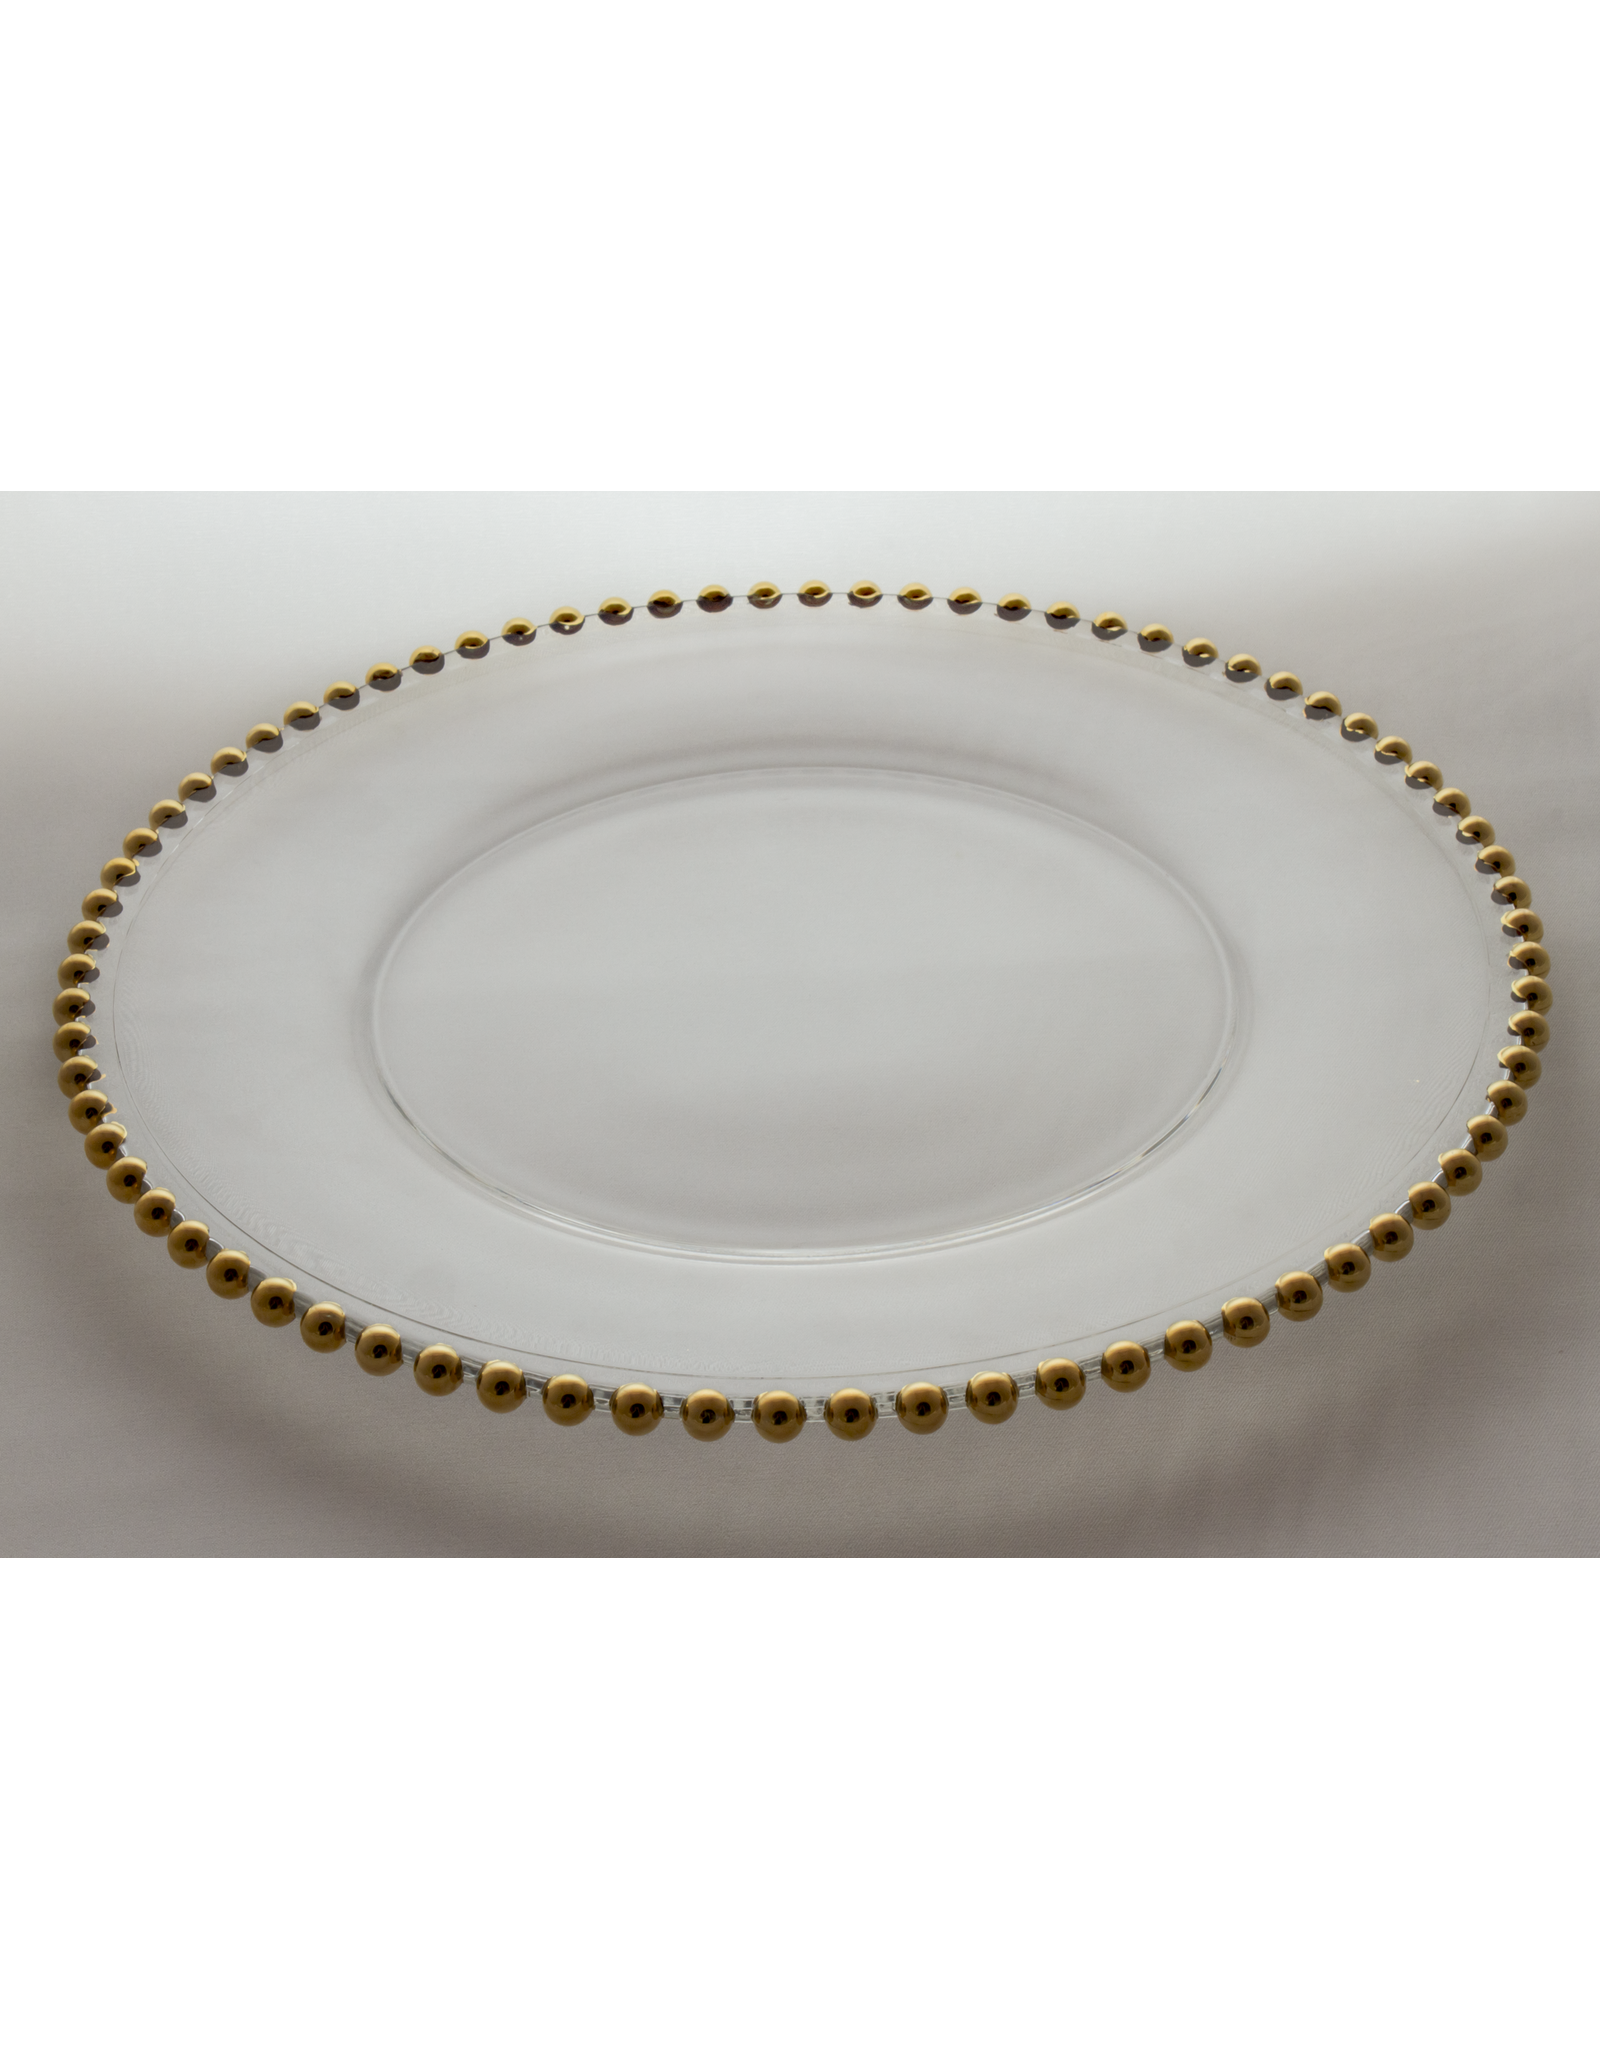 Skloglass Belmonte kristal serveerbord met gouden parels